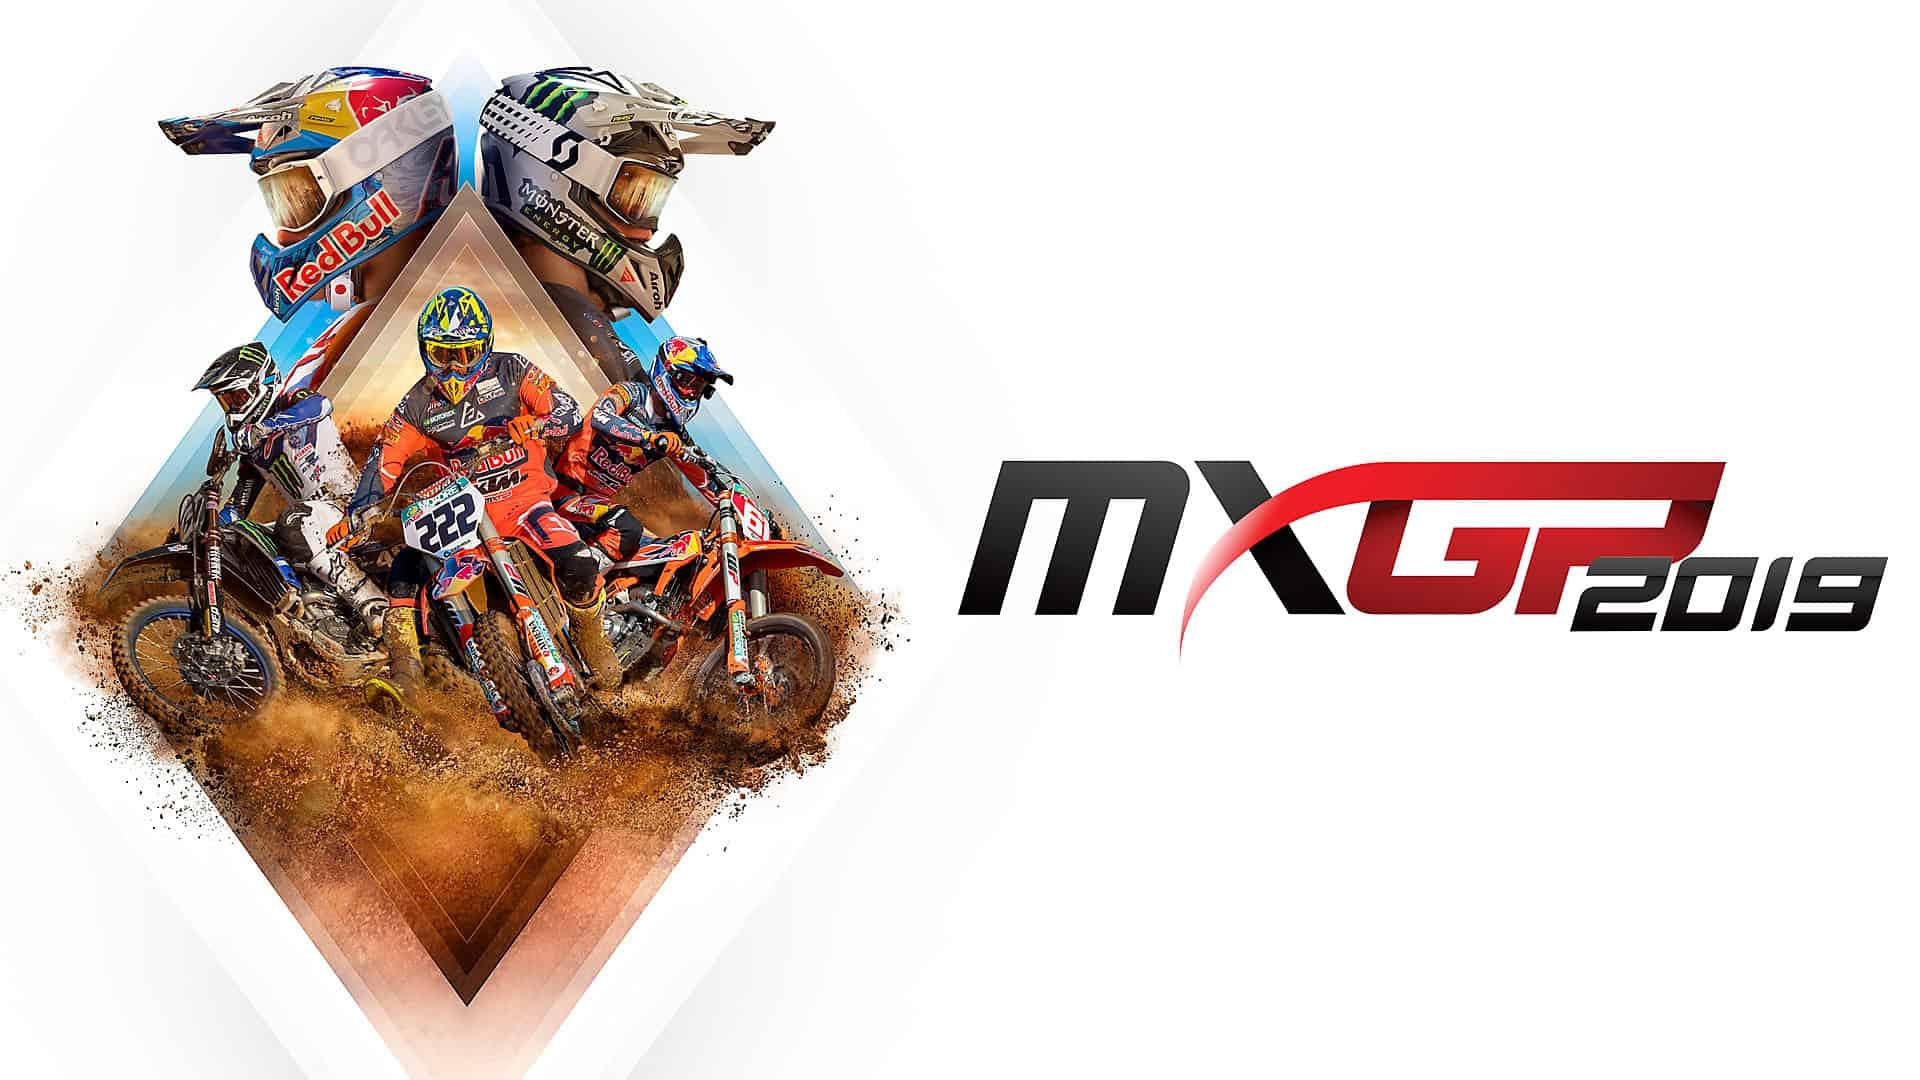 Milestone Launches MXGP 2019